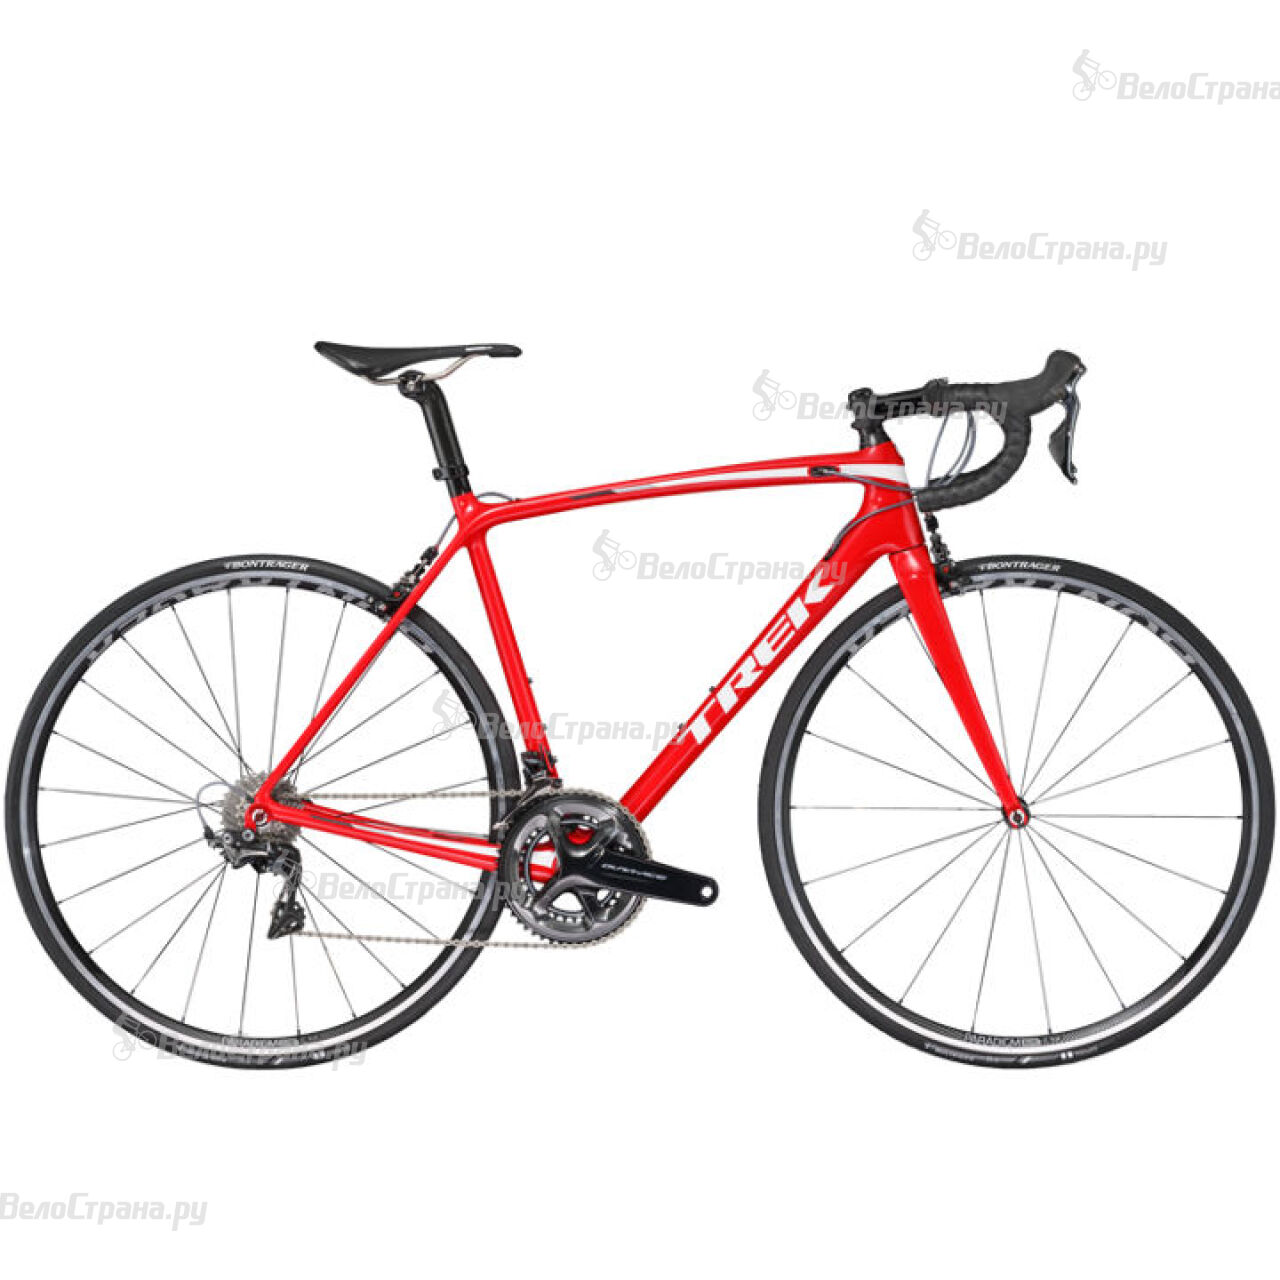 Велосипед Trek Emonda SLR 8 RSL H1 (2017)